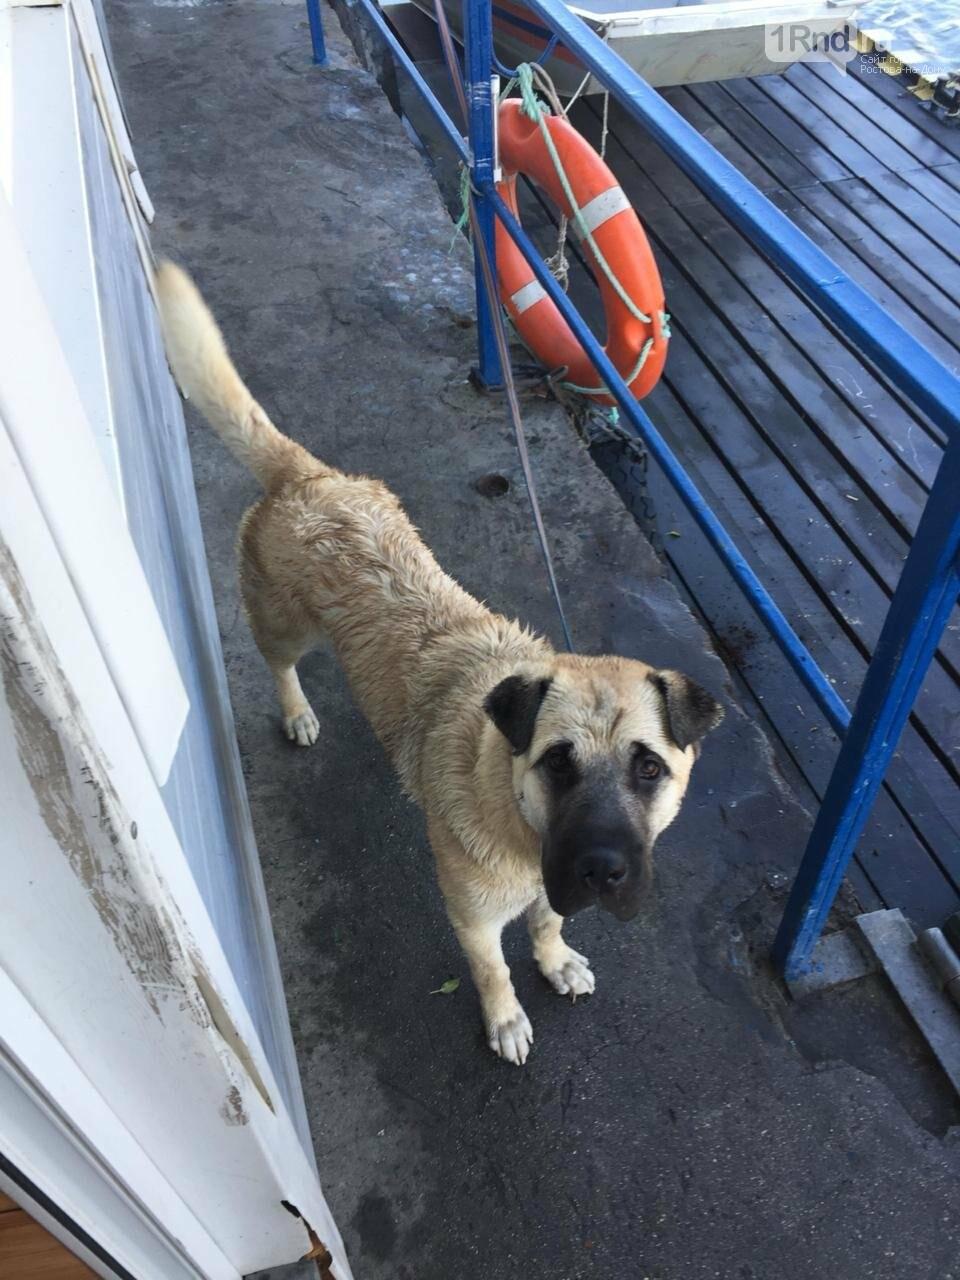 В Азове мужчина едва не утонул в Дону, спасая свою собаку, фото-1